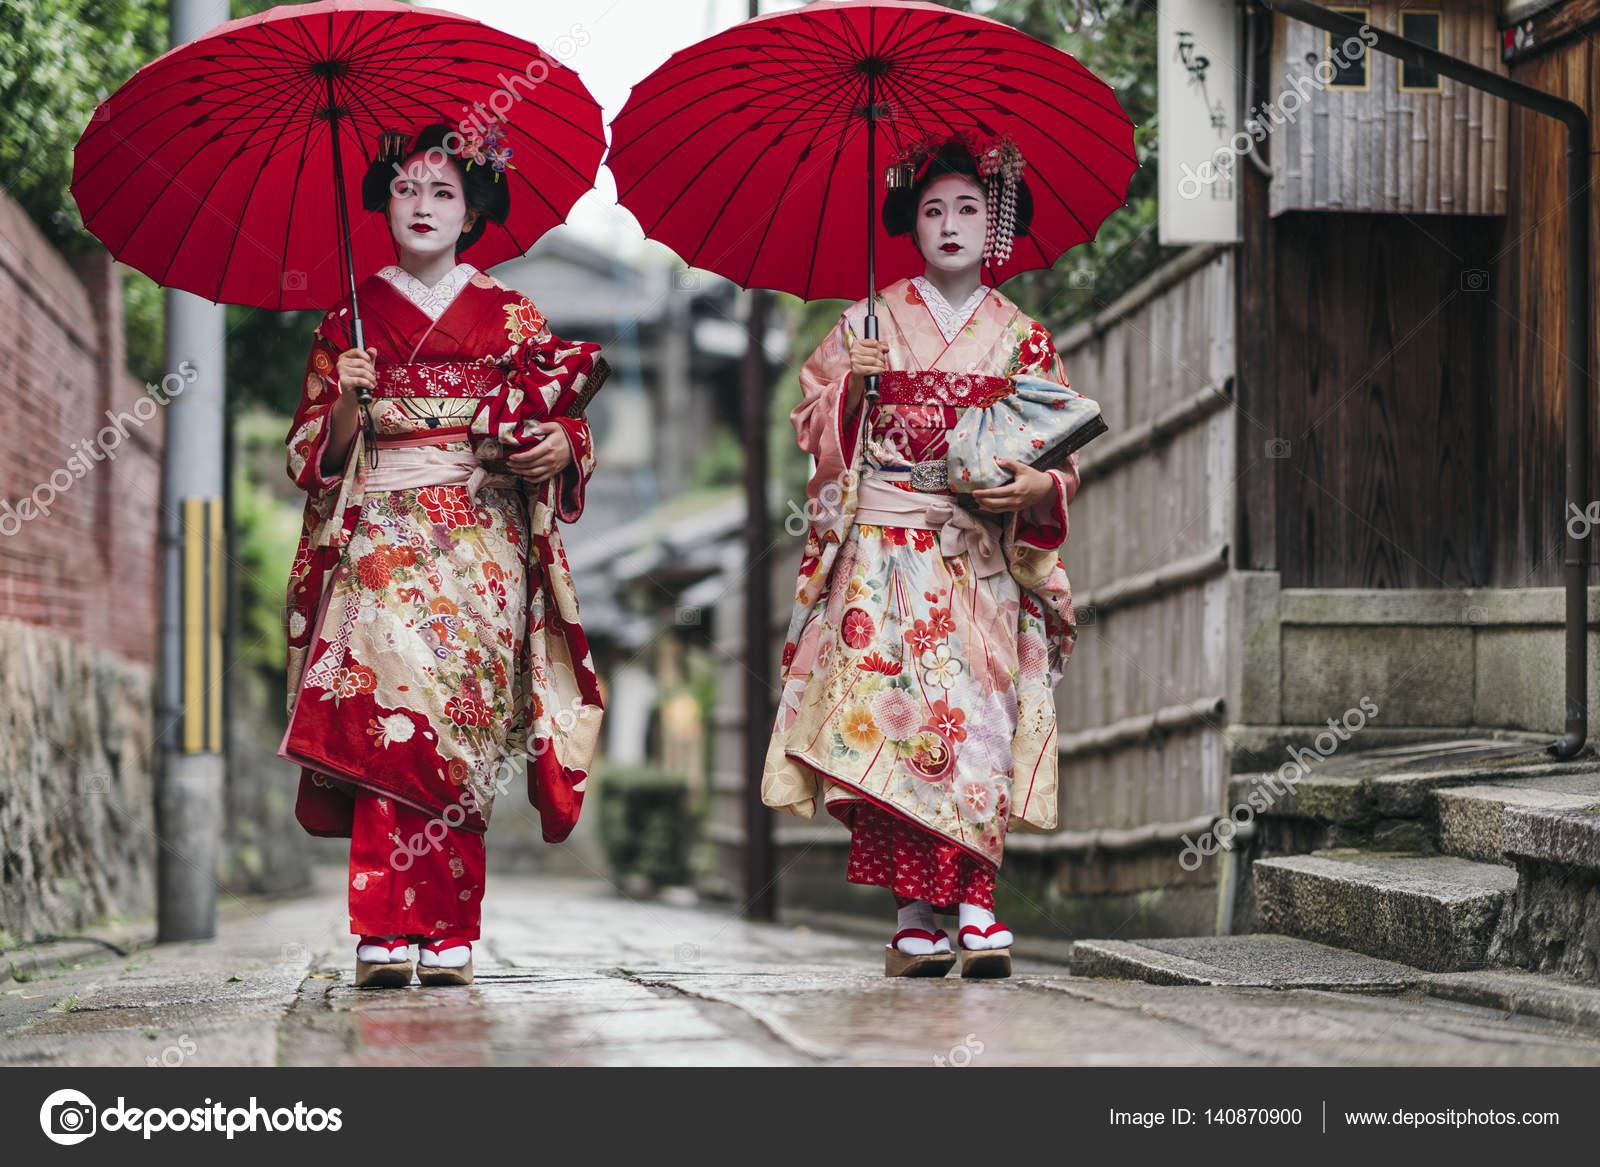 5877ac5ab7b1 Γκέισα μας περπατώντας στον δρόμο της Gion στο Κιότο της Ιαπωνίας — Εικόνα  από ...